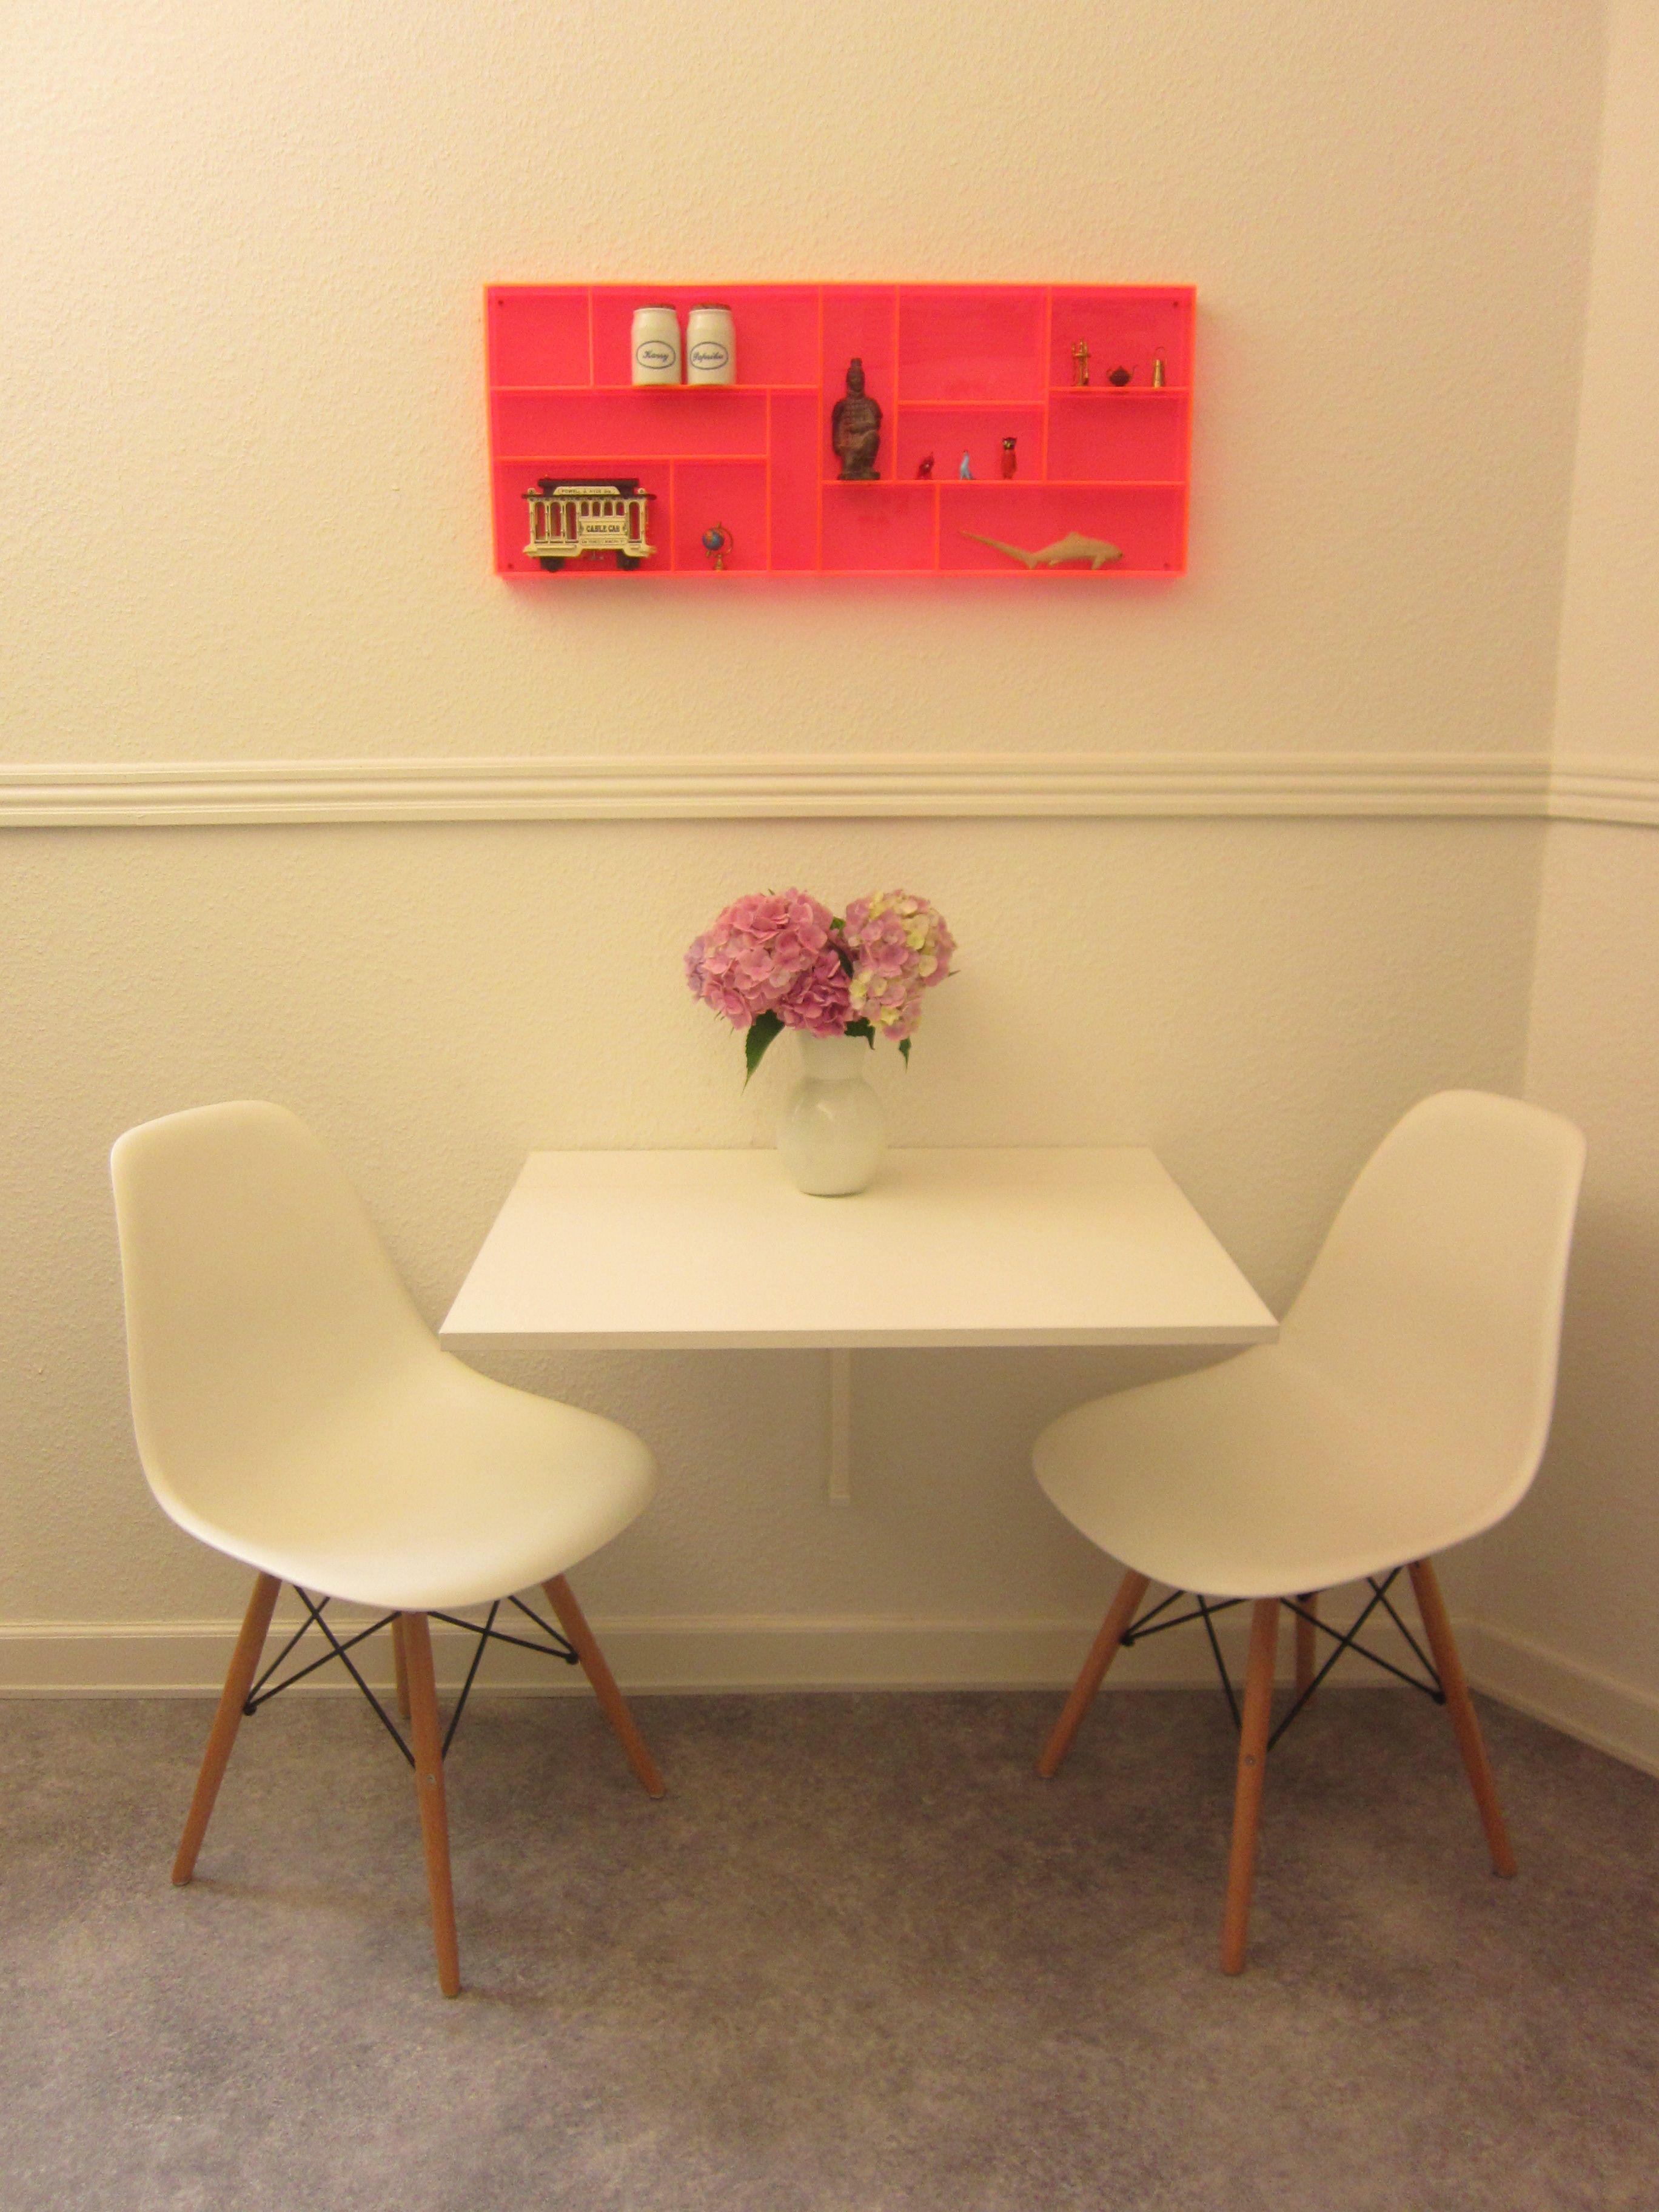 replica stol Billige Charles Eames replica stol | Interiør | Pinterest  replica stol